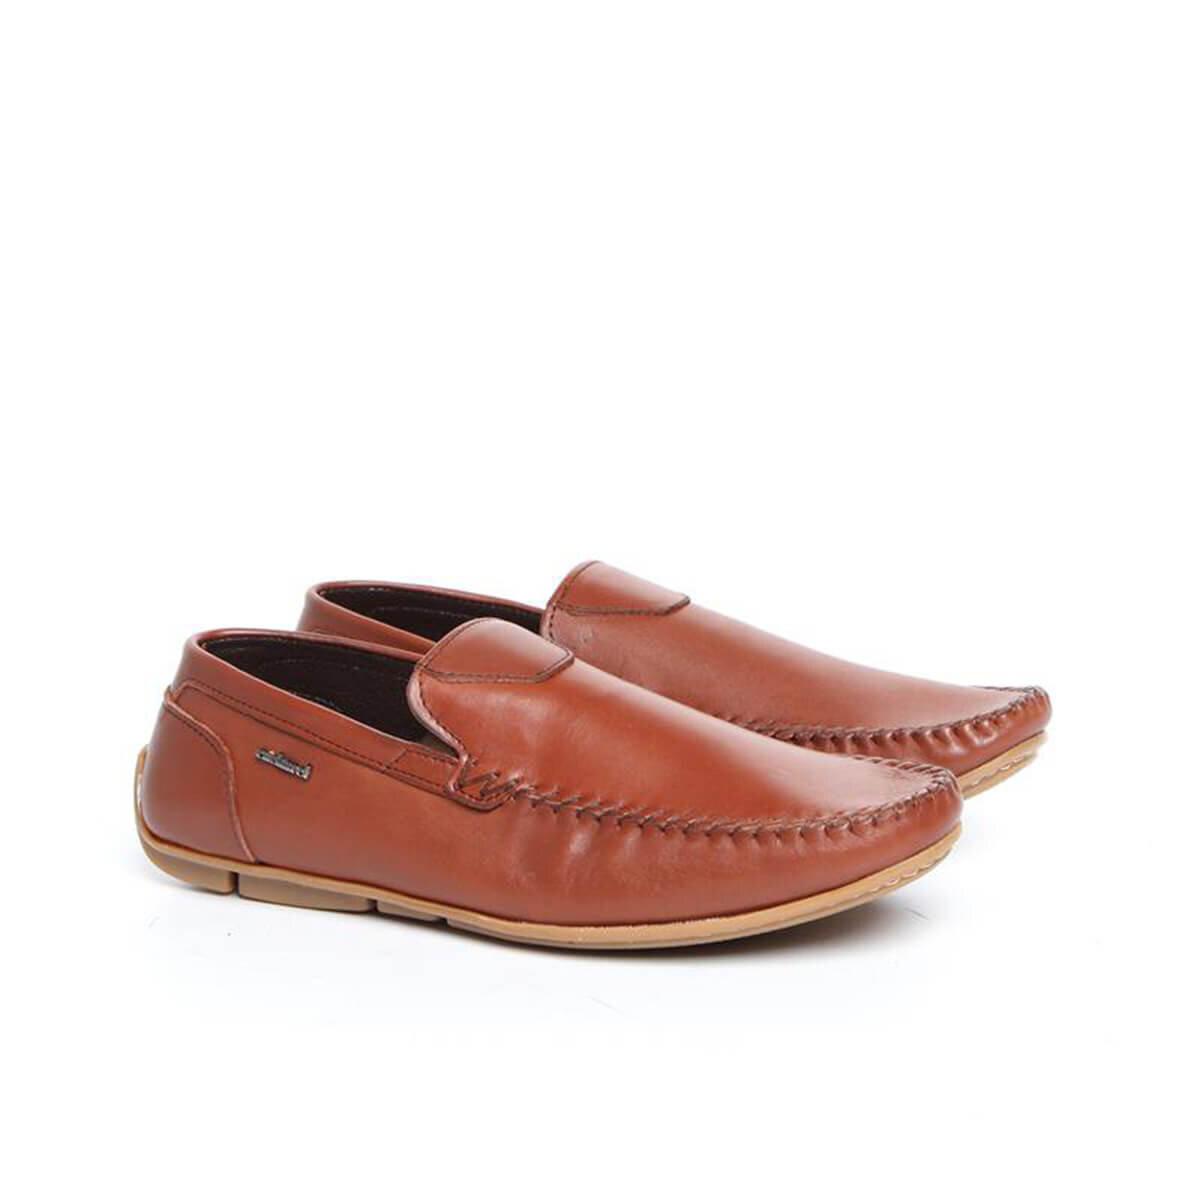 Kahverengi Erkek Loafer Ayakkabı C8021F-2